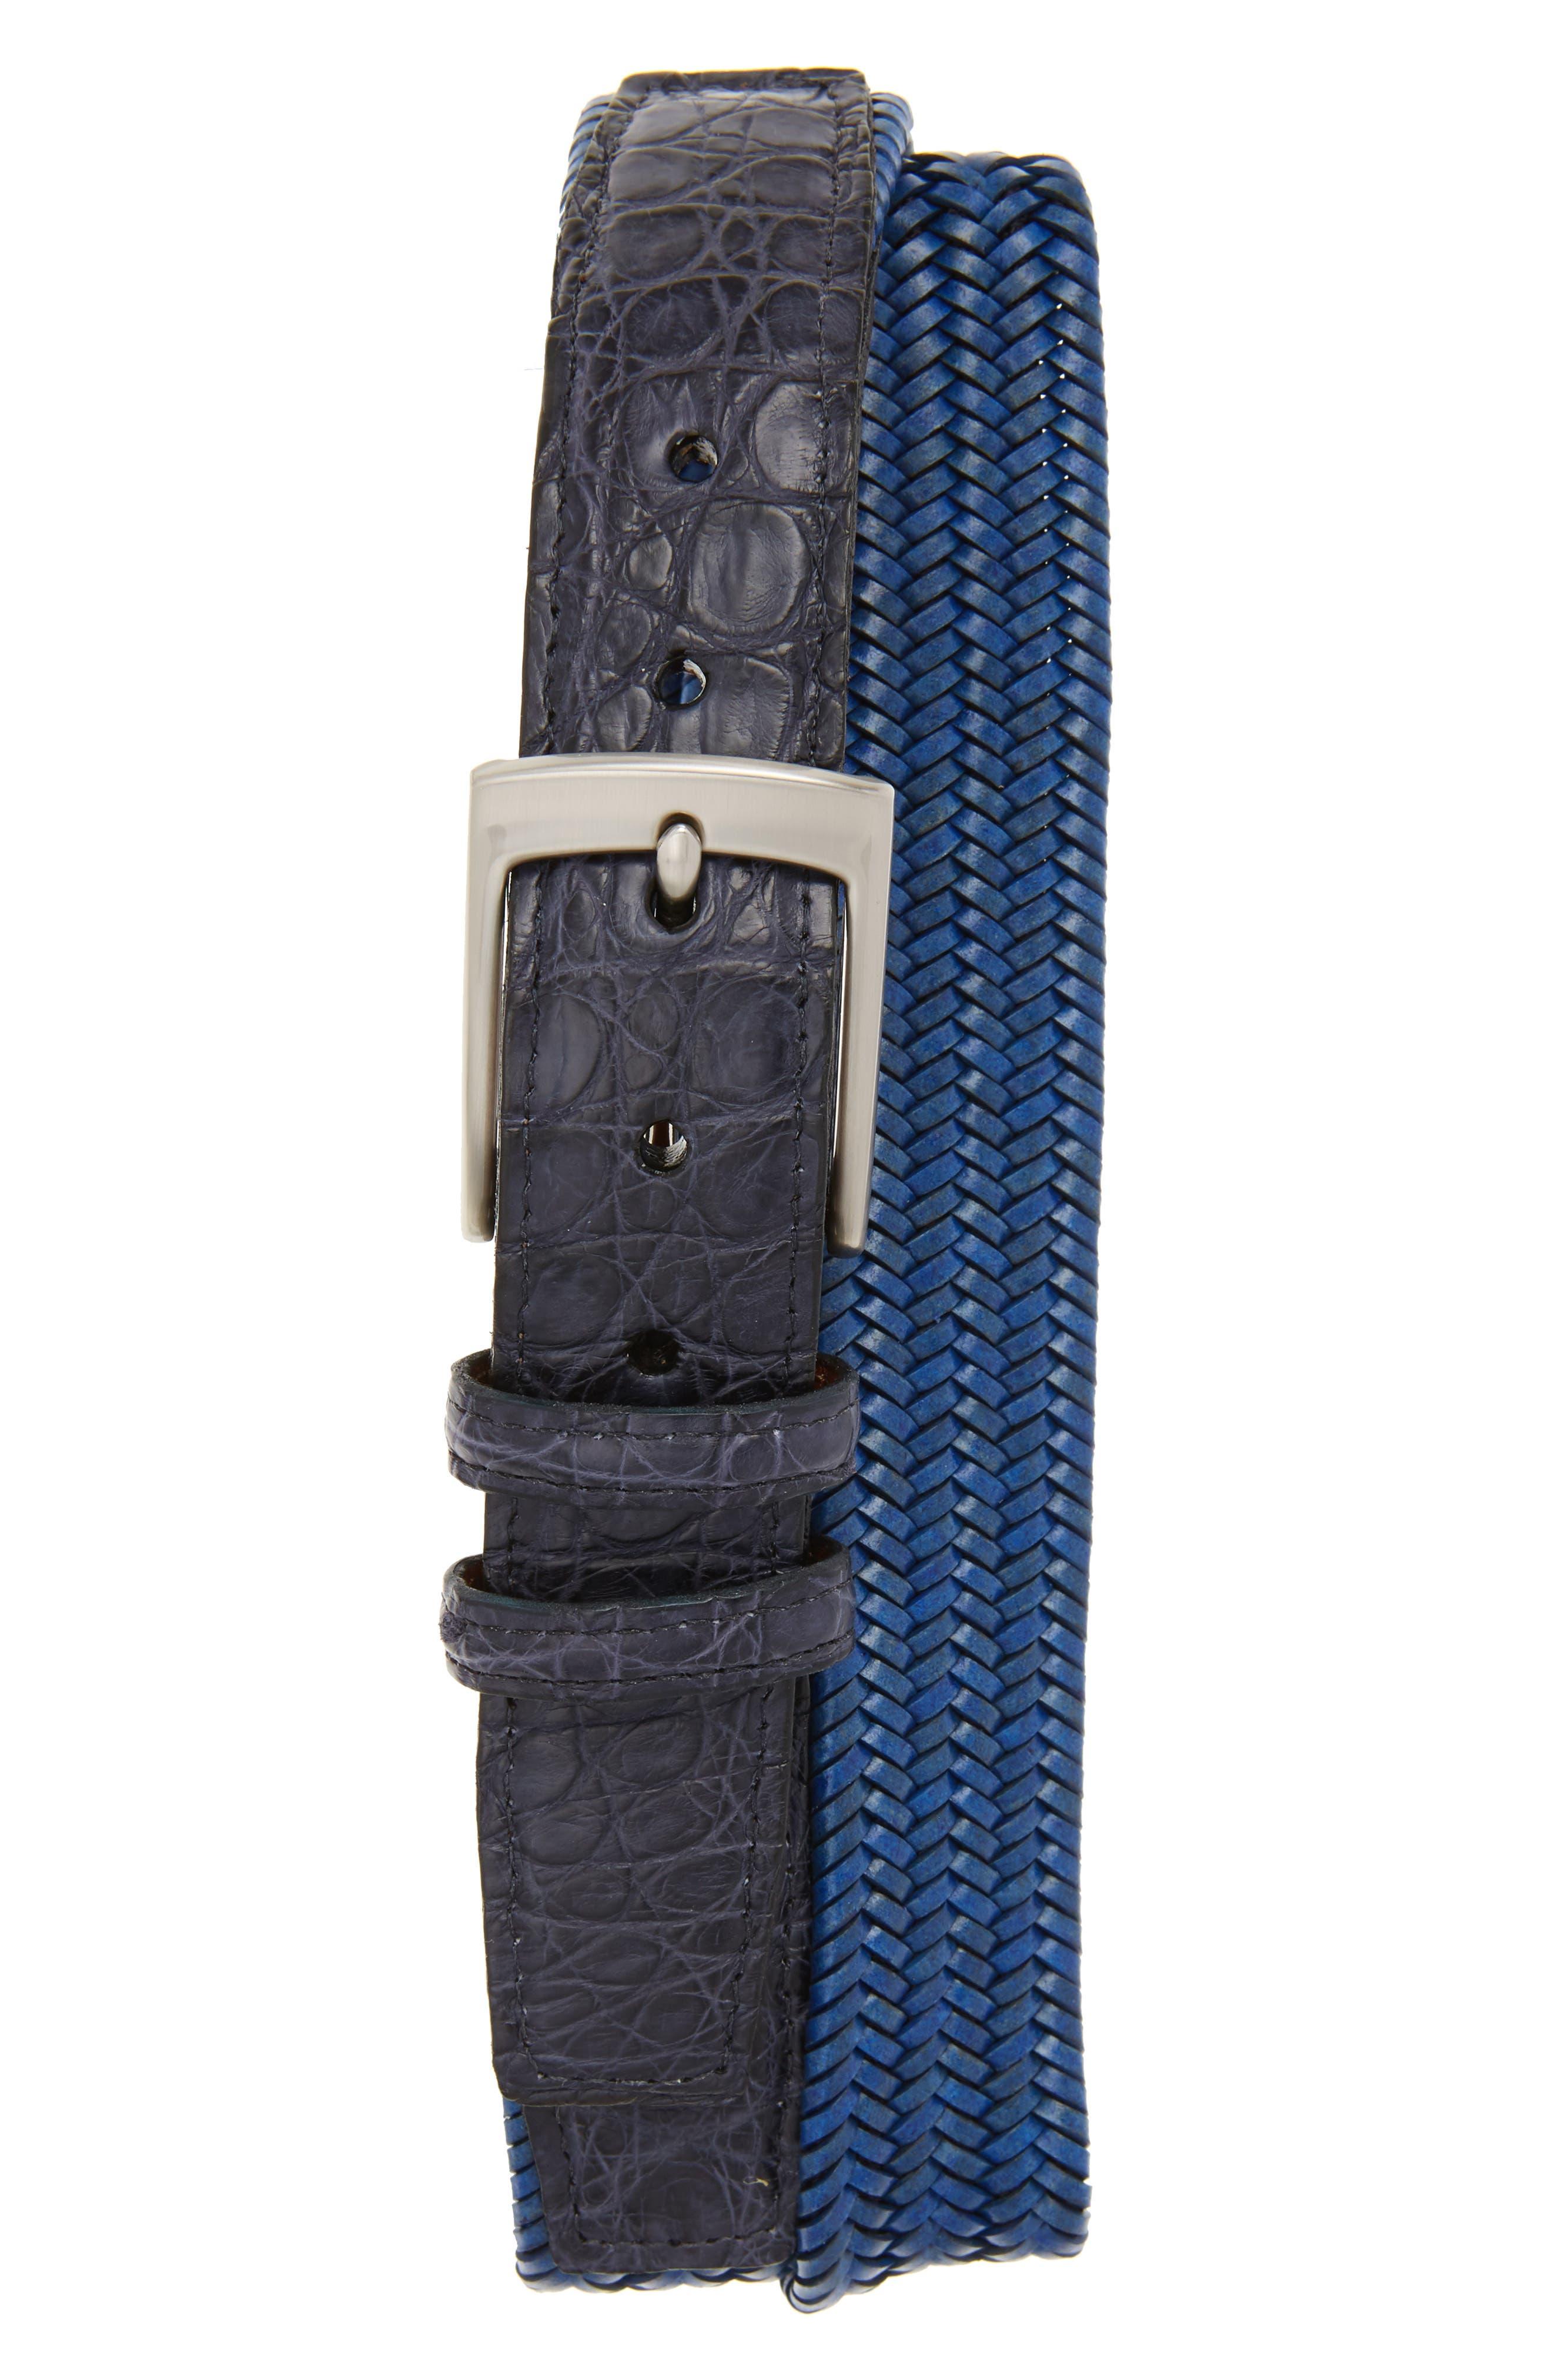 Main Image - Torino Belts Stretch Woven Leather Belt